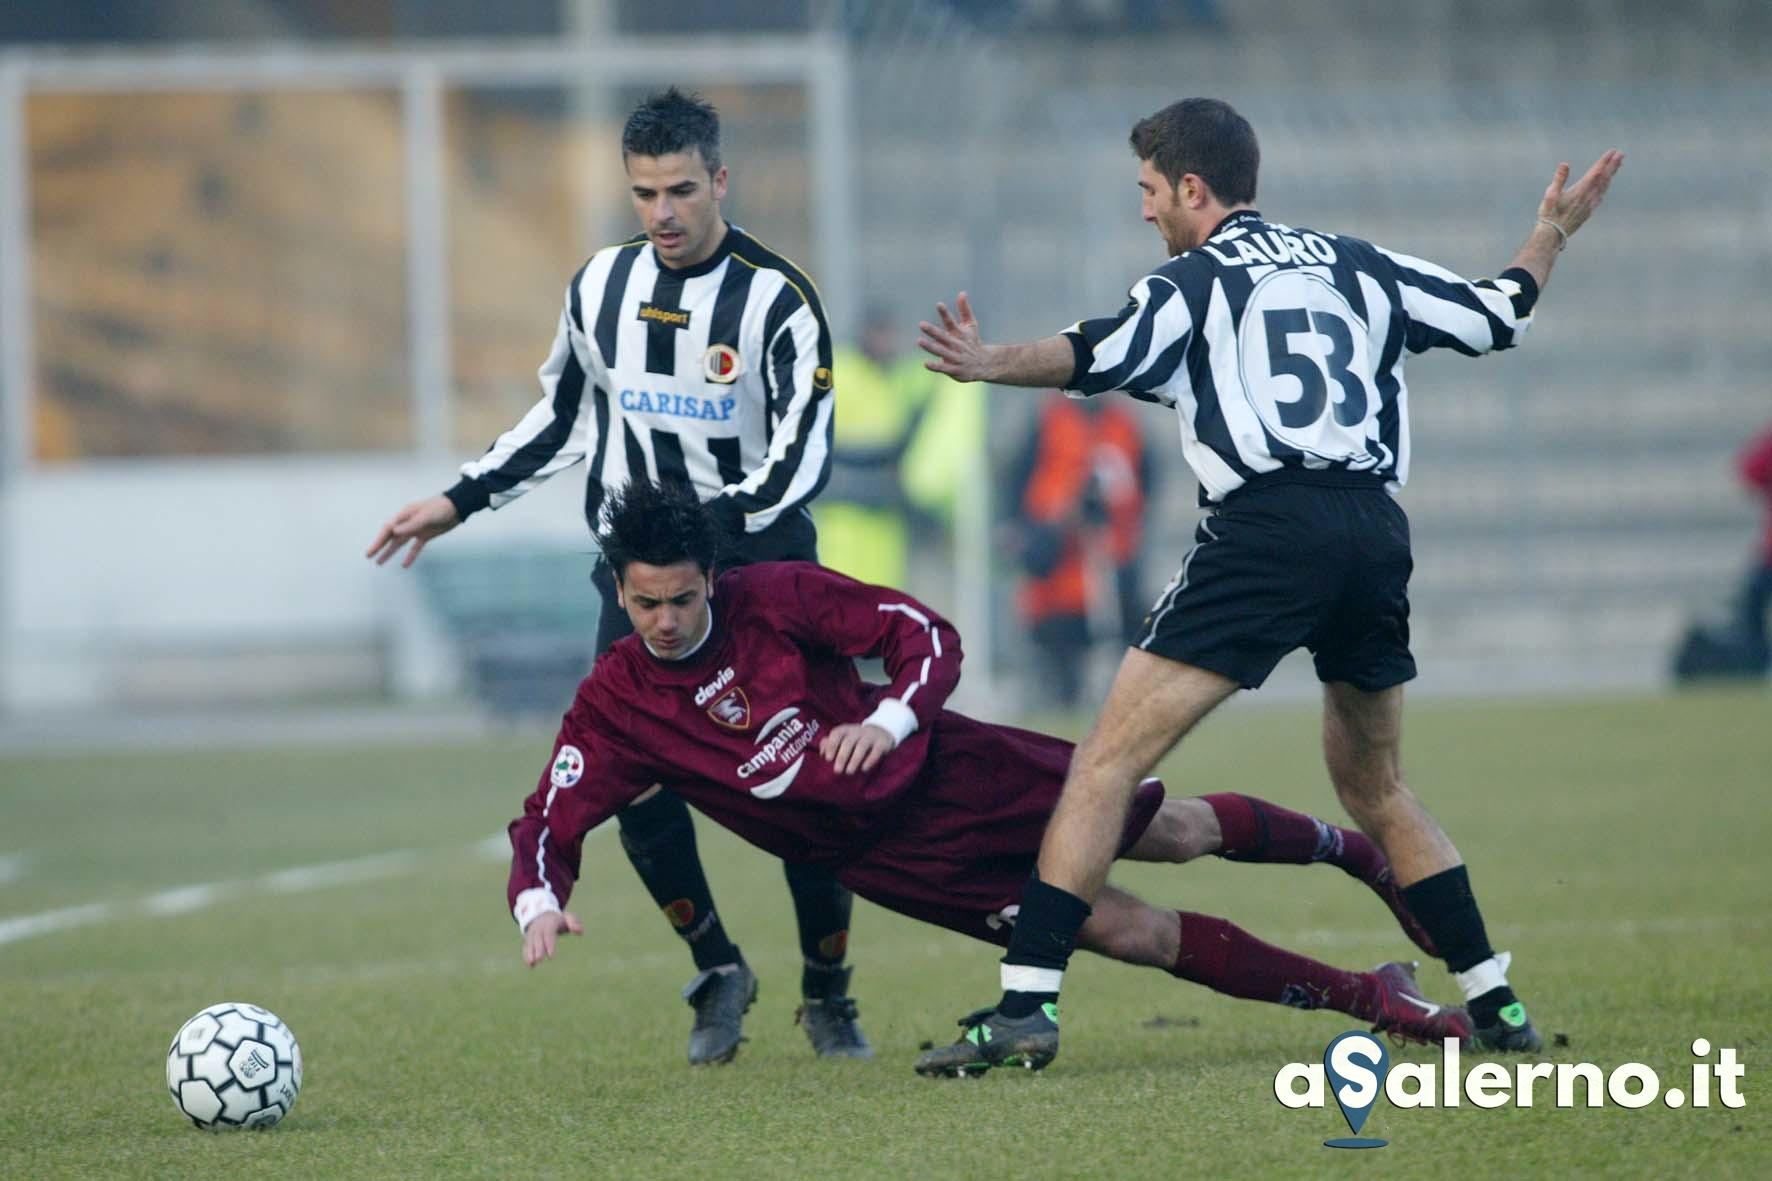 ascoli salernitana Palladino Raffaele